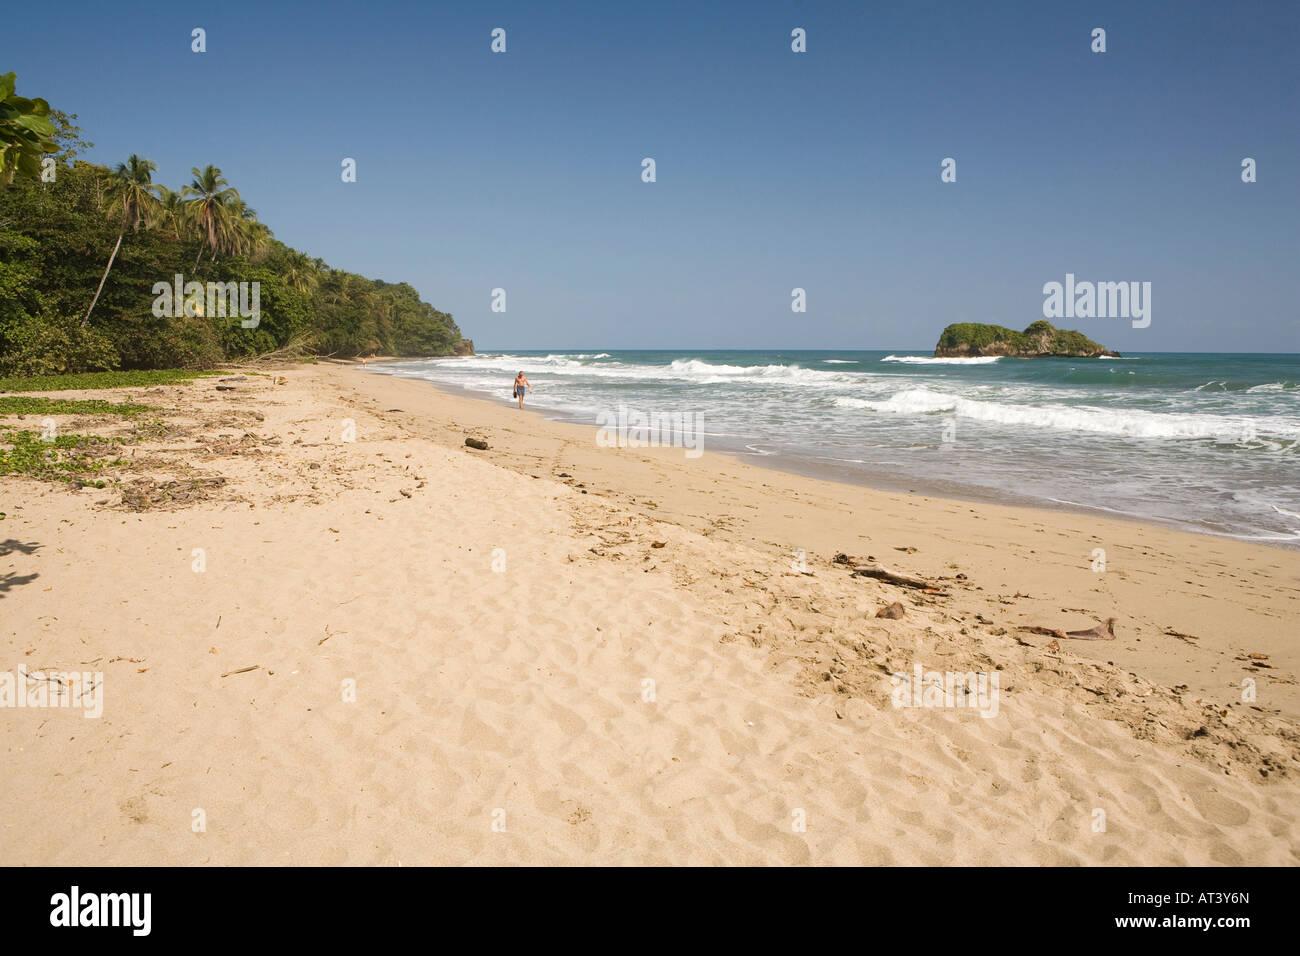 Costa Rica Caribbean Coast Puerto Viejo de Talamanca Cocles lone sunbather on soft sandy beach - Stock Image